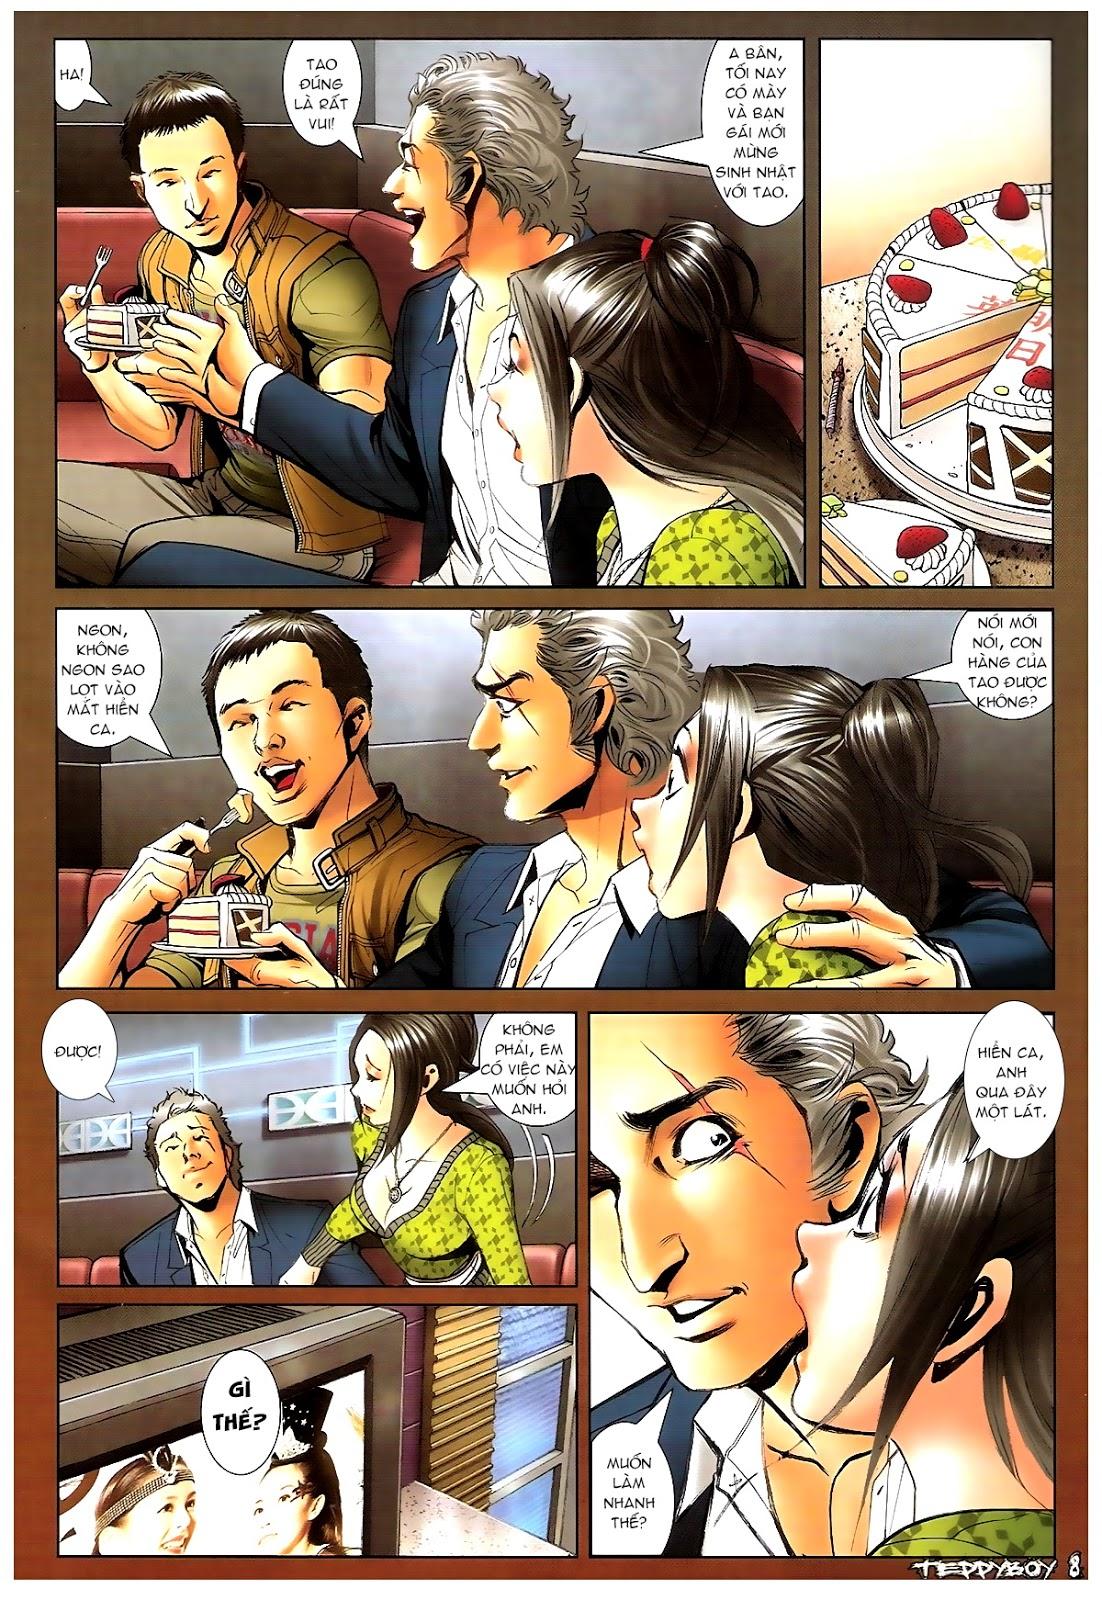 Người Trong Giang Hồ - Chapter 1379: Oan gia gặp nhau - Pic 6